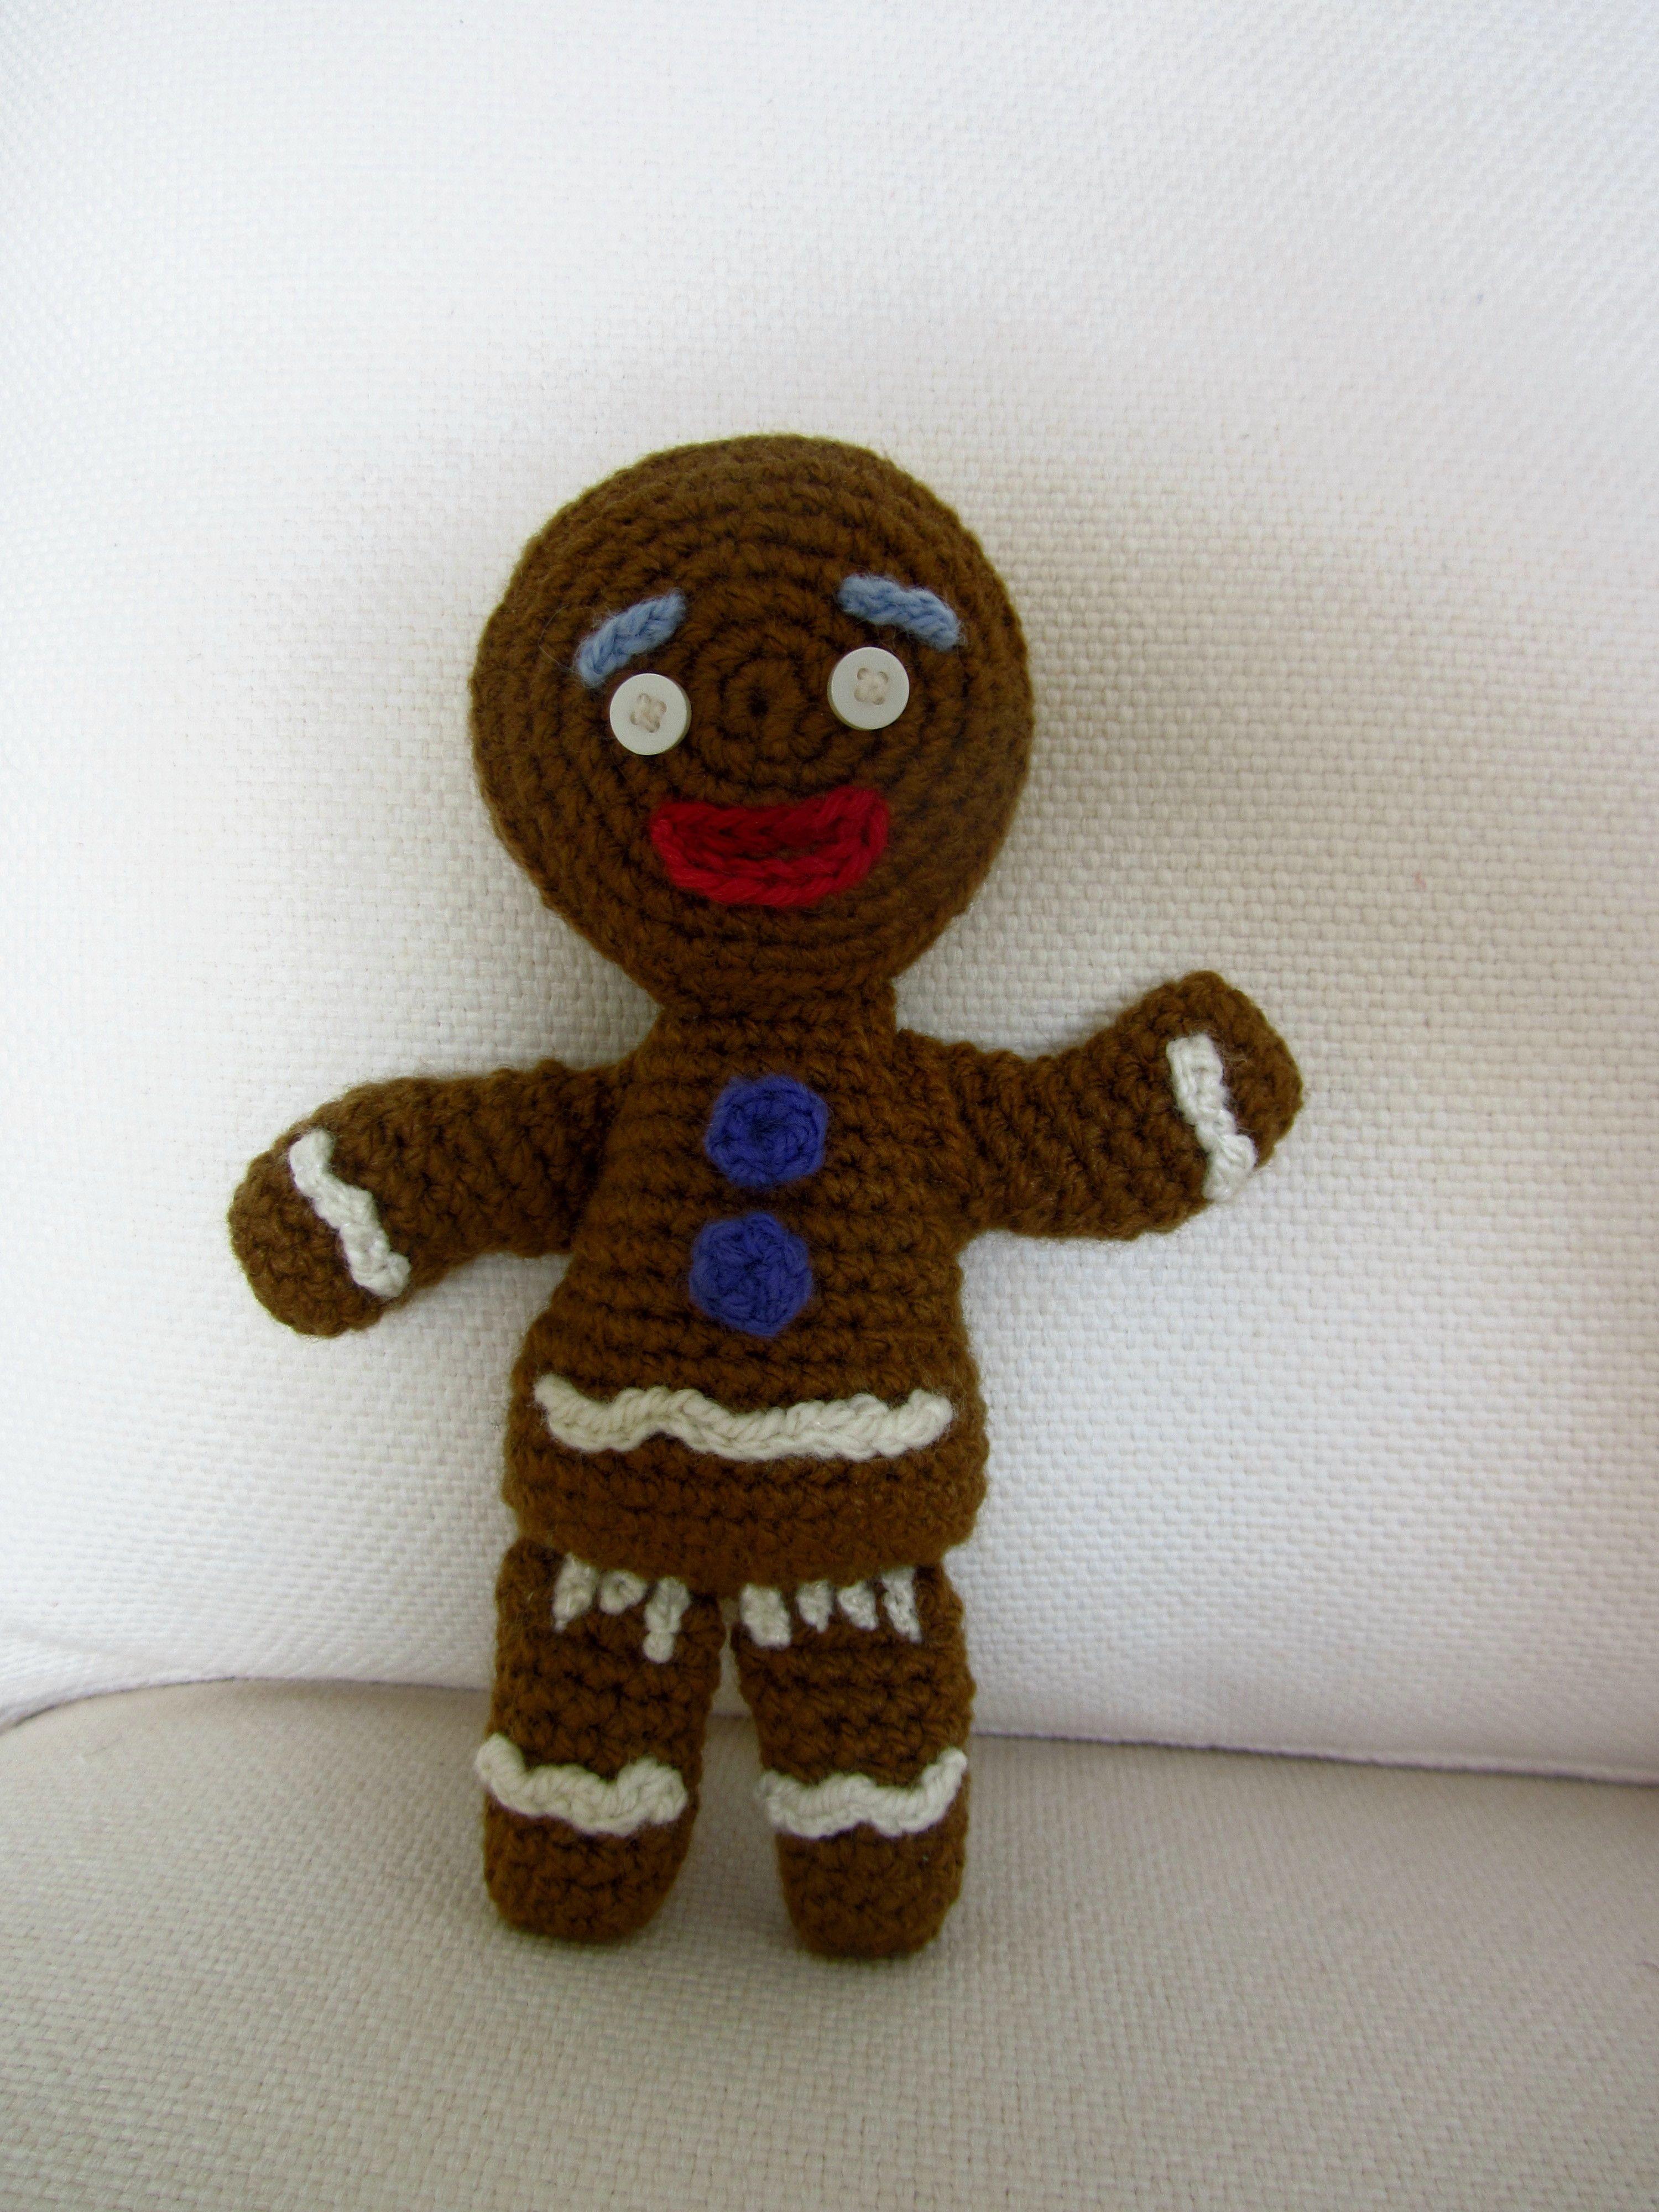 shrek gingerbread man amigurumi, crochet doll, galleta de jengibre a ...